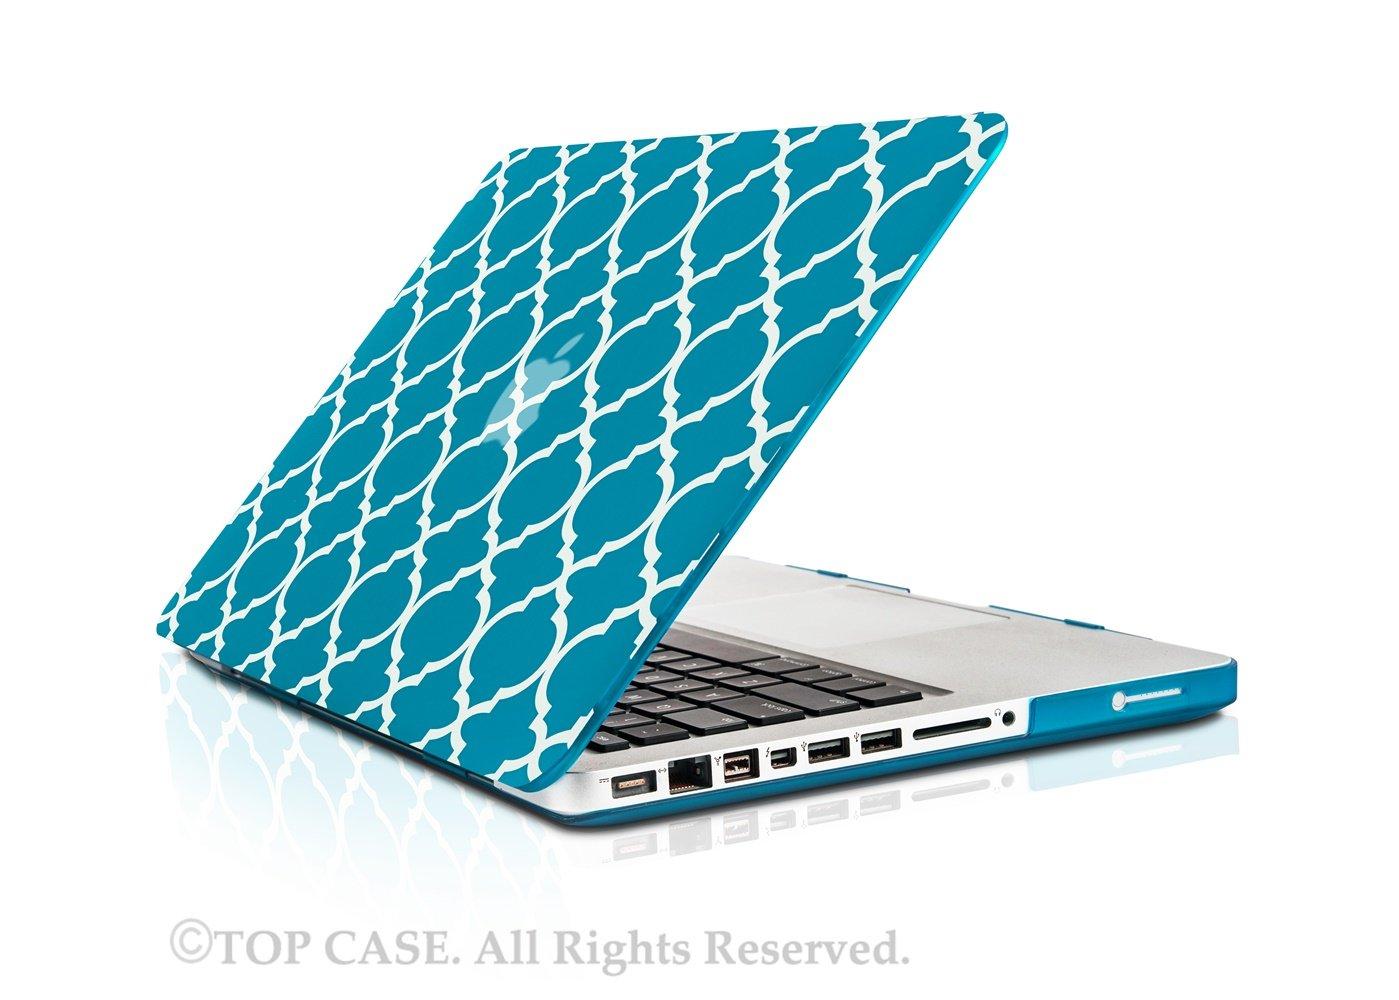 "Keyboard Cover LCD for Macbook Pro 15/"" Model A1286 Aqua Blue Quatrefoil Case"